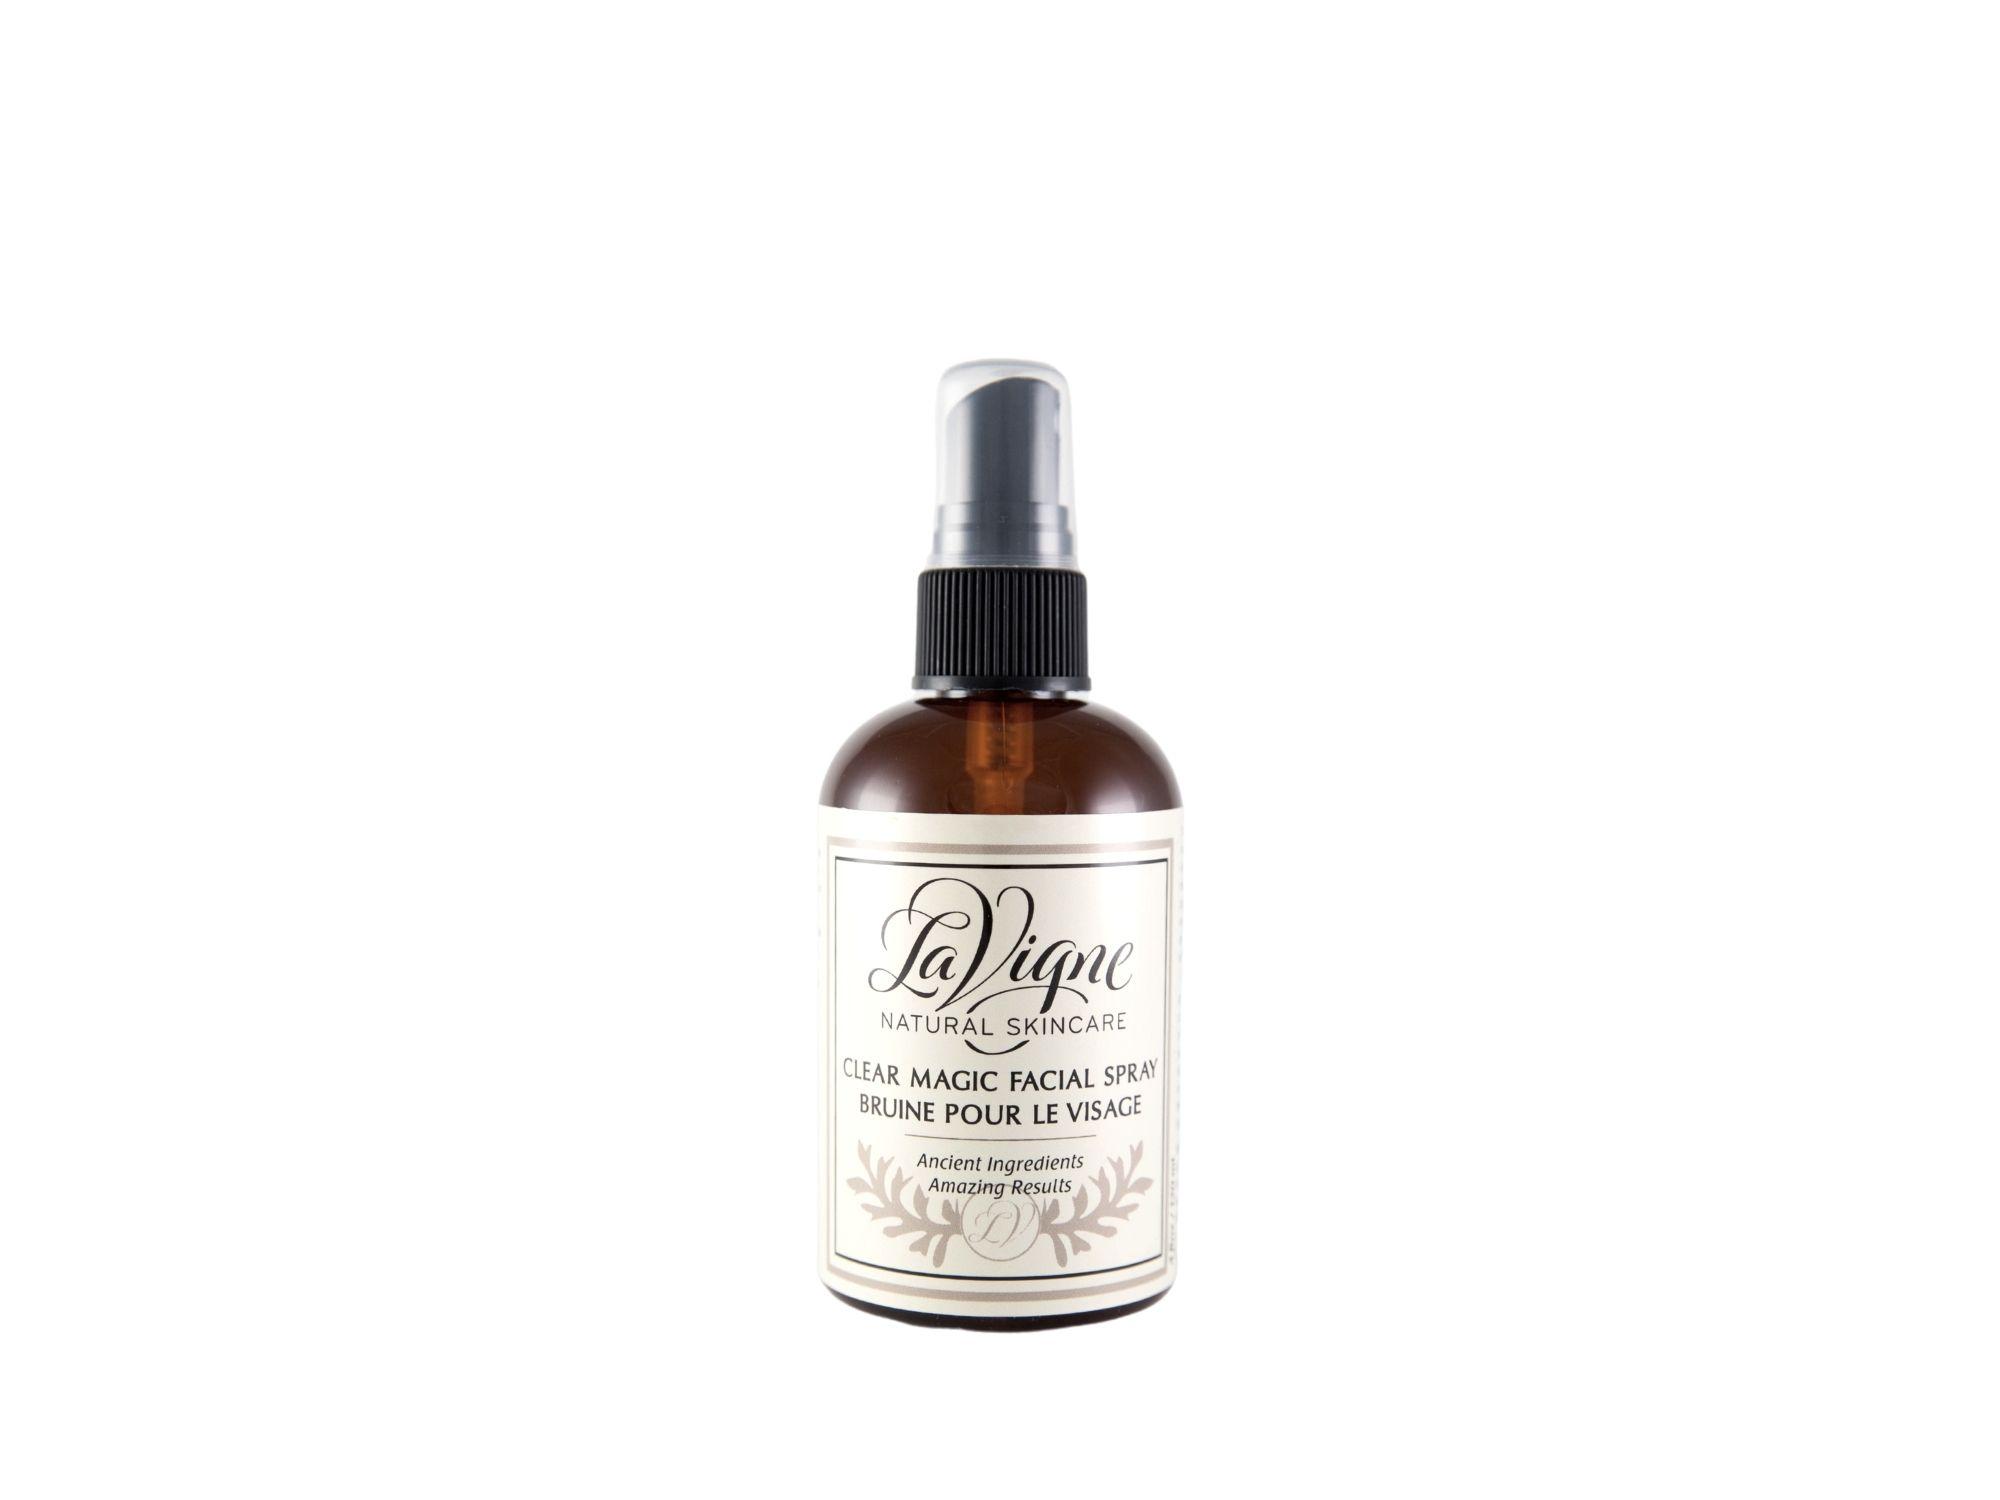 LaVigne Clear Magic Facial Spray (4oz/120ml)